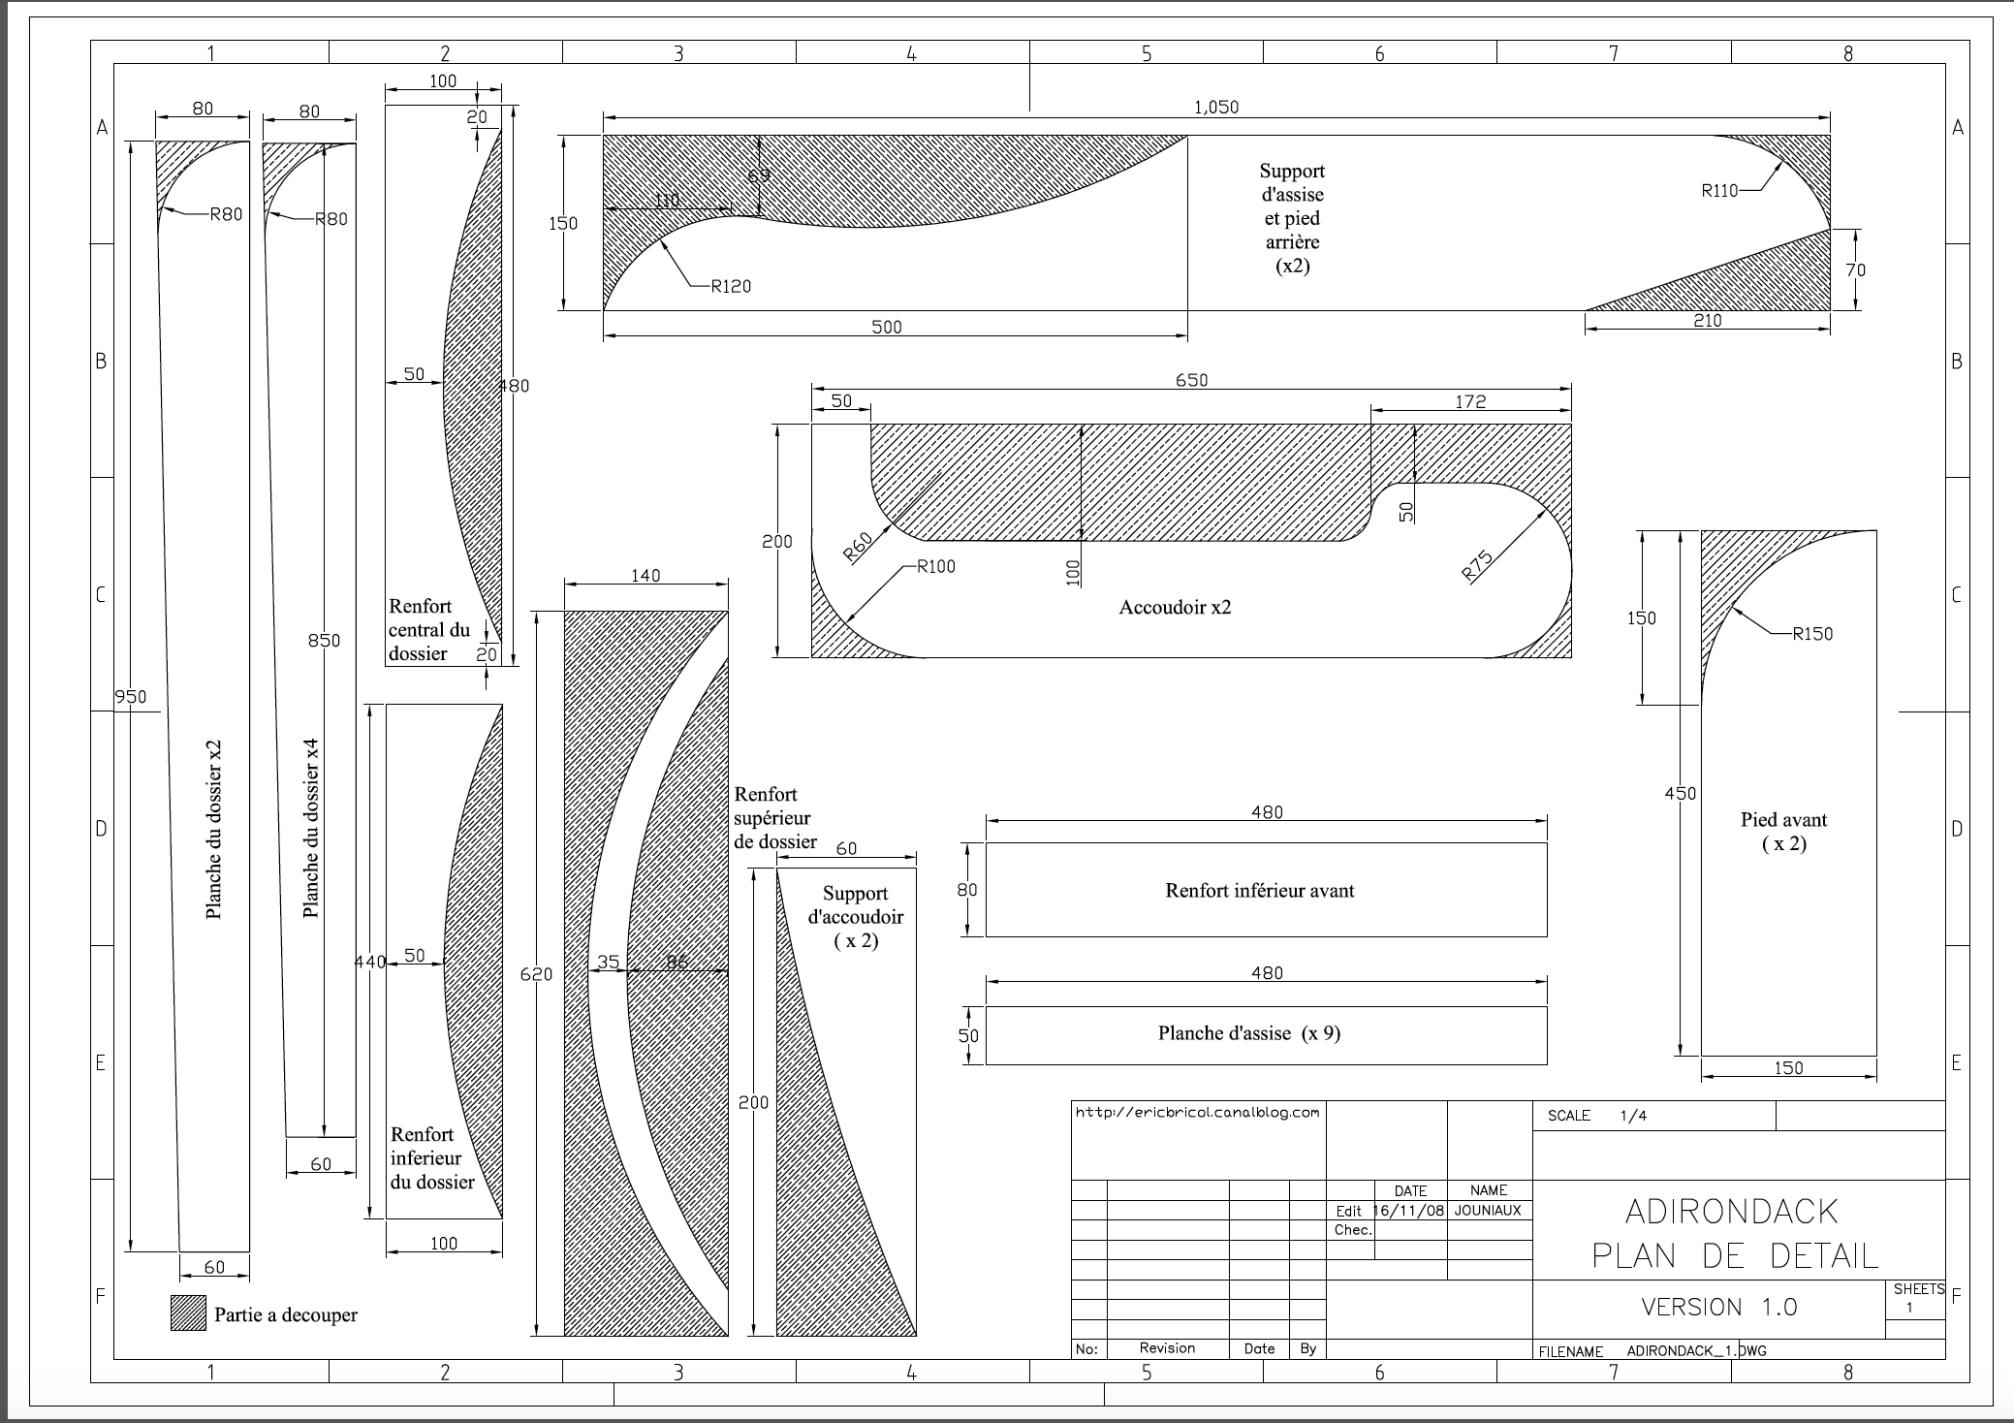 Coussin Pour Fauteuil Adirondack chaise adirondack plan pdf | fauteuil adirondack, chaise et